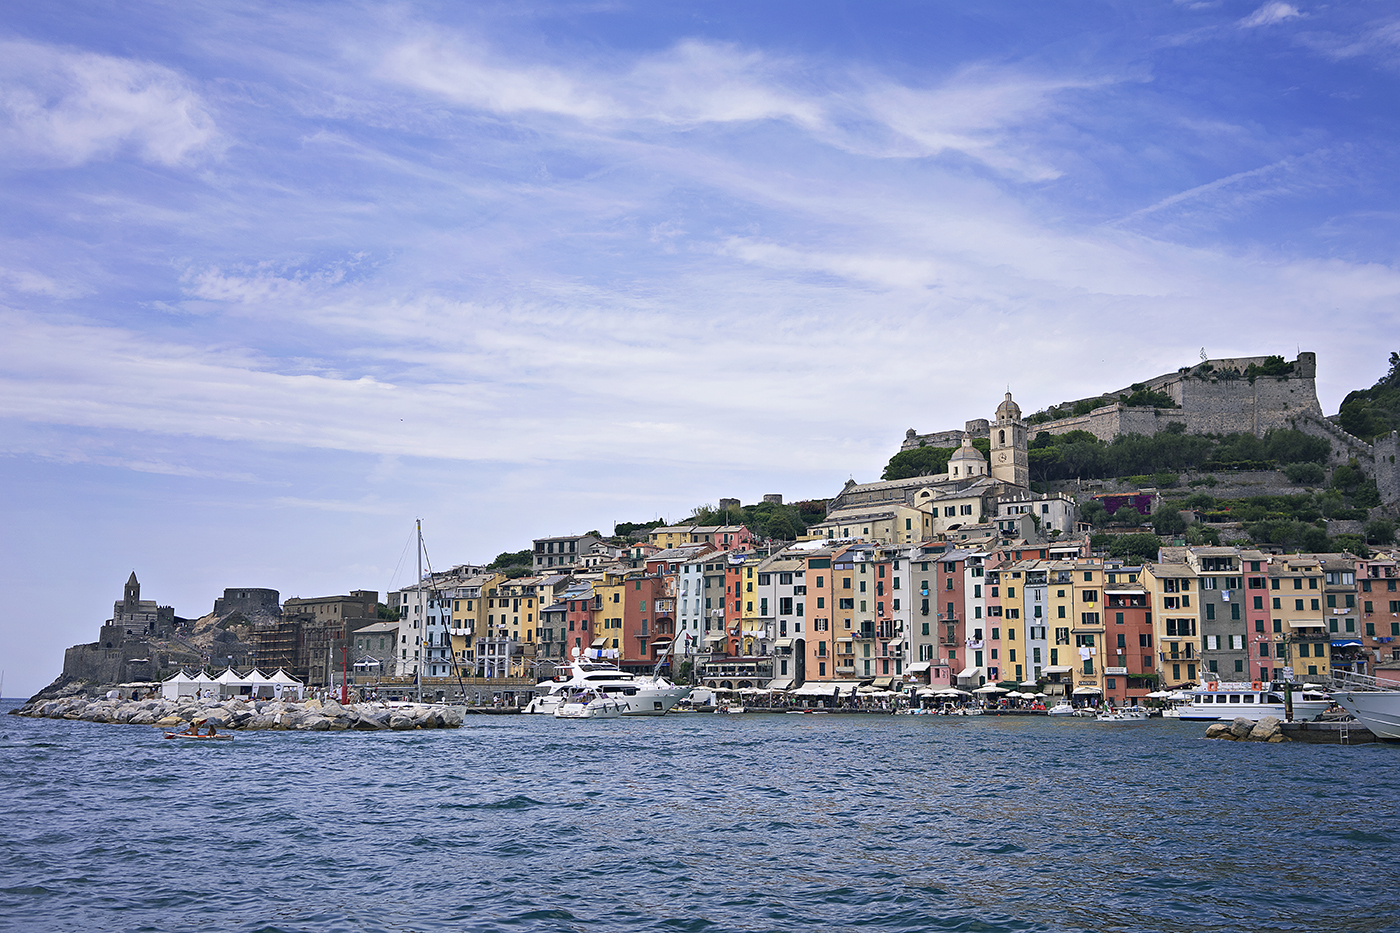 Exploring Liguria: Portovenere